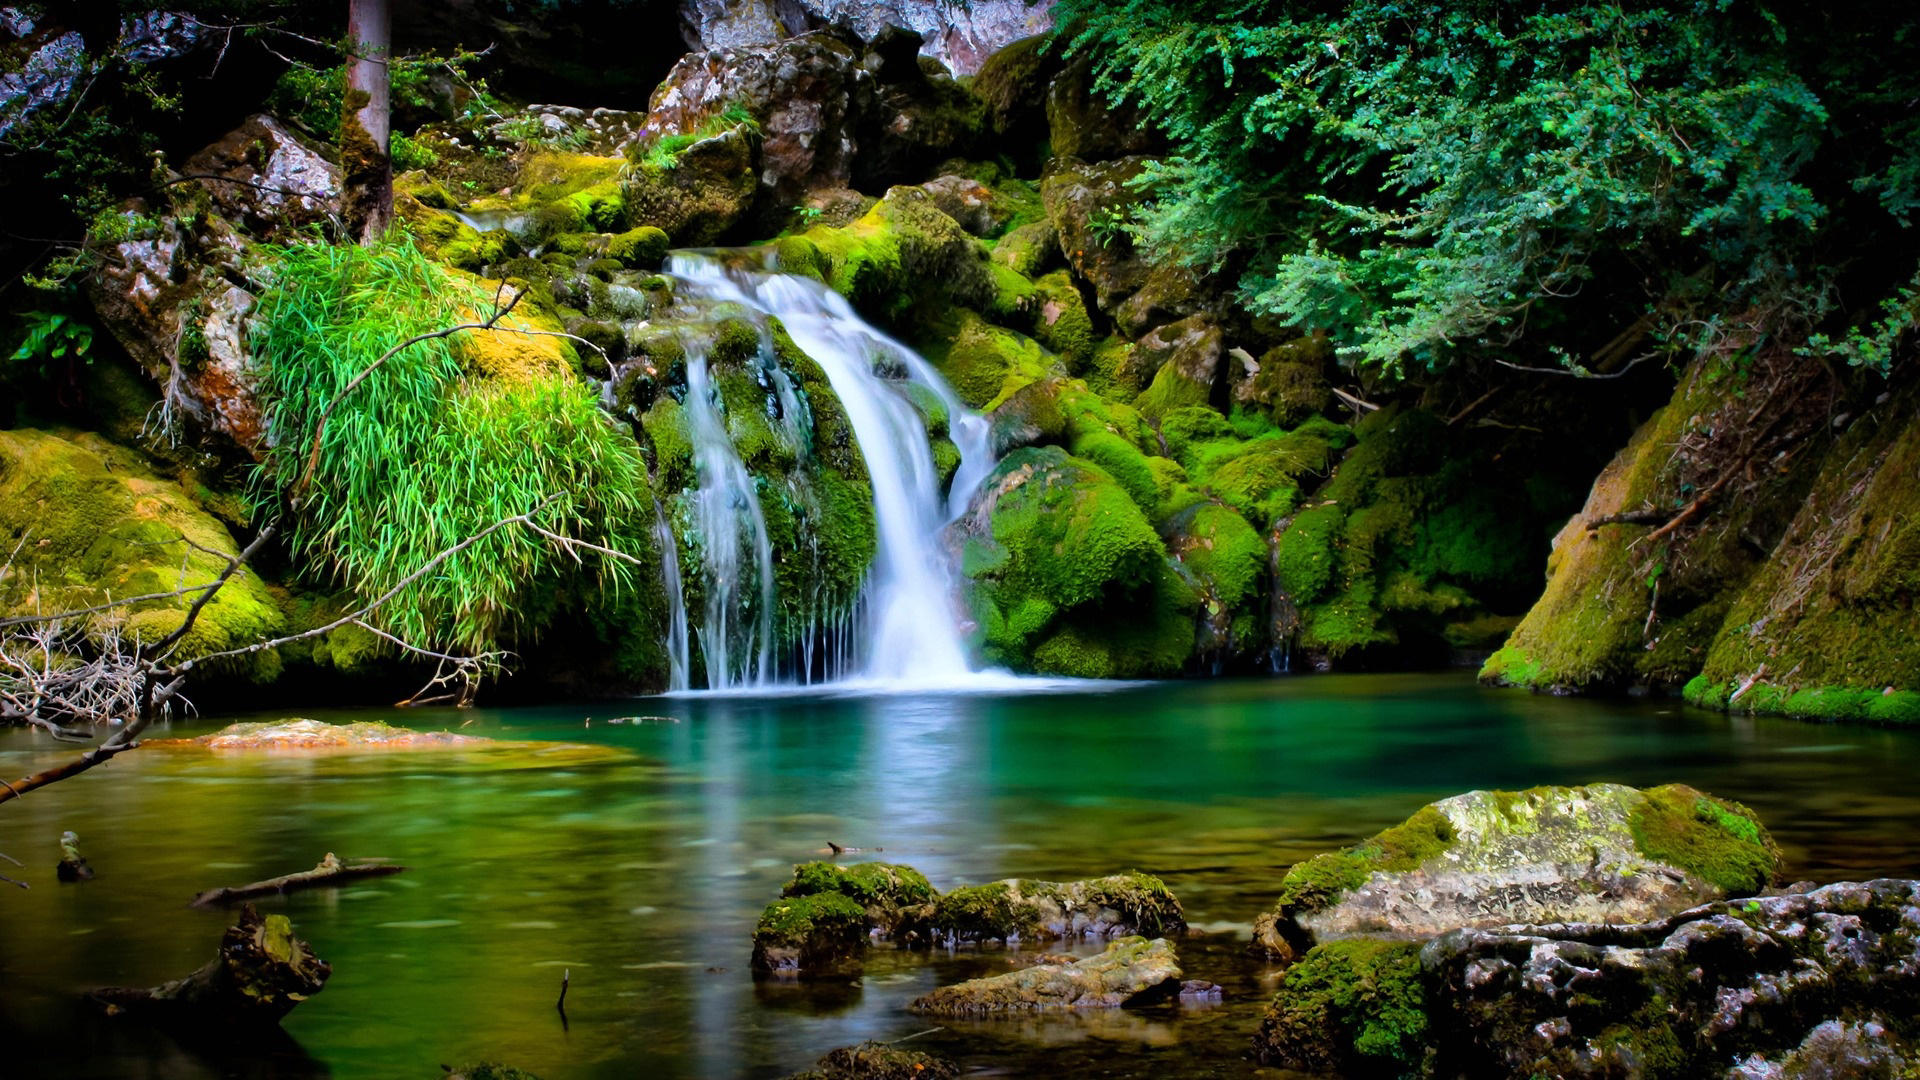 Green Nature Waterfall 4460 Wallpaper Hd 1920x1080